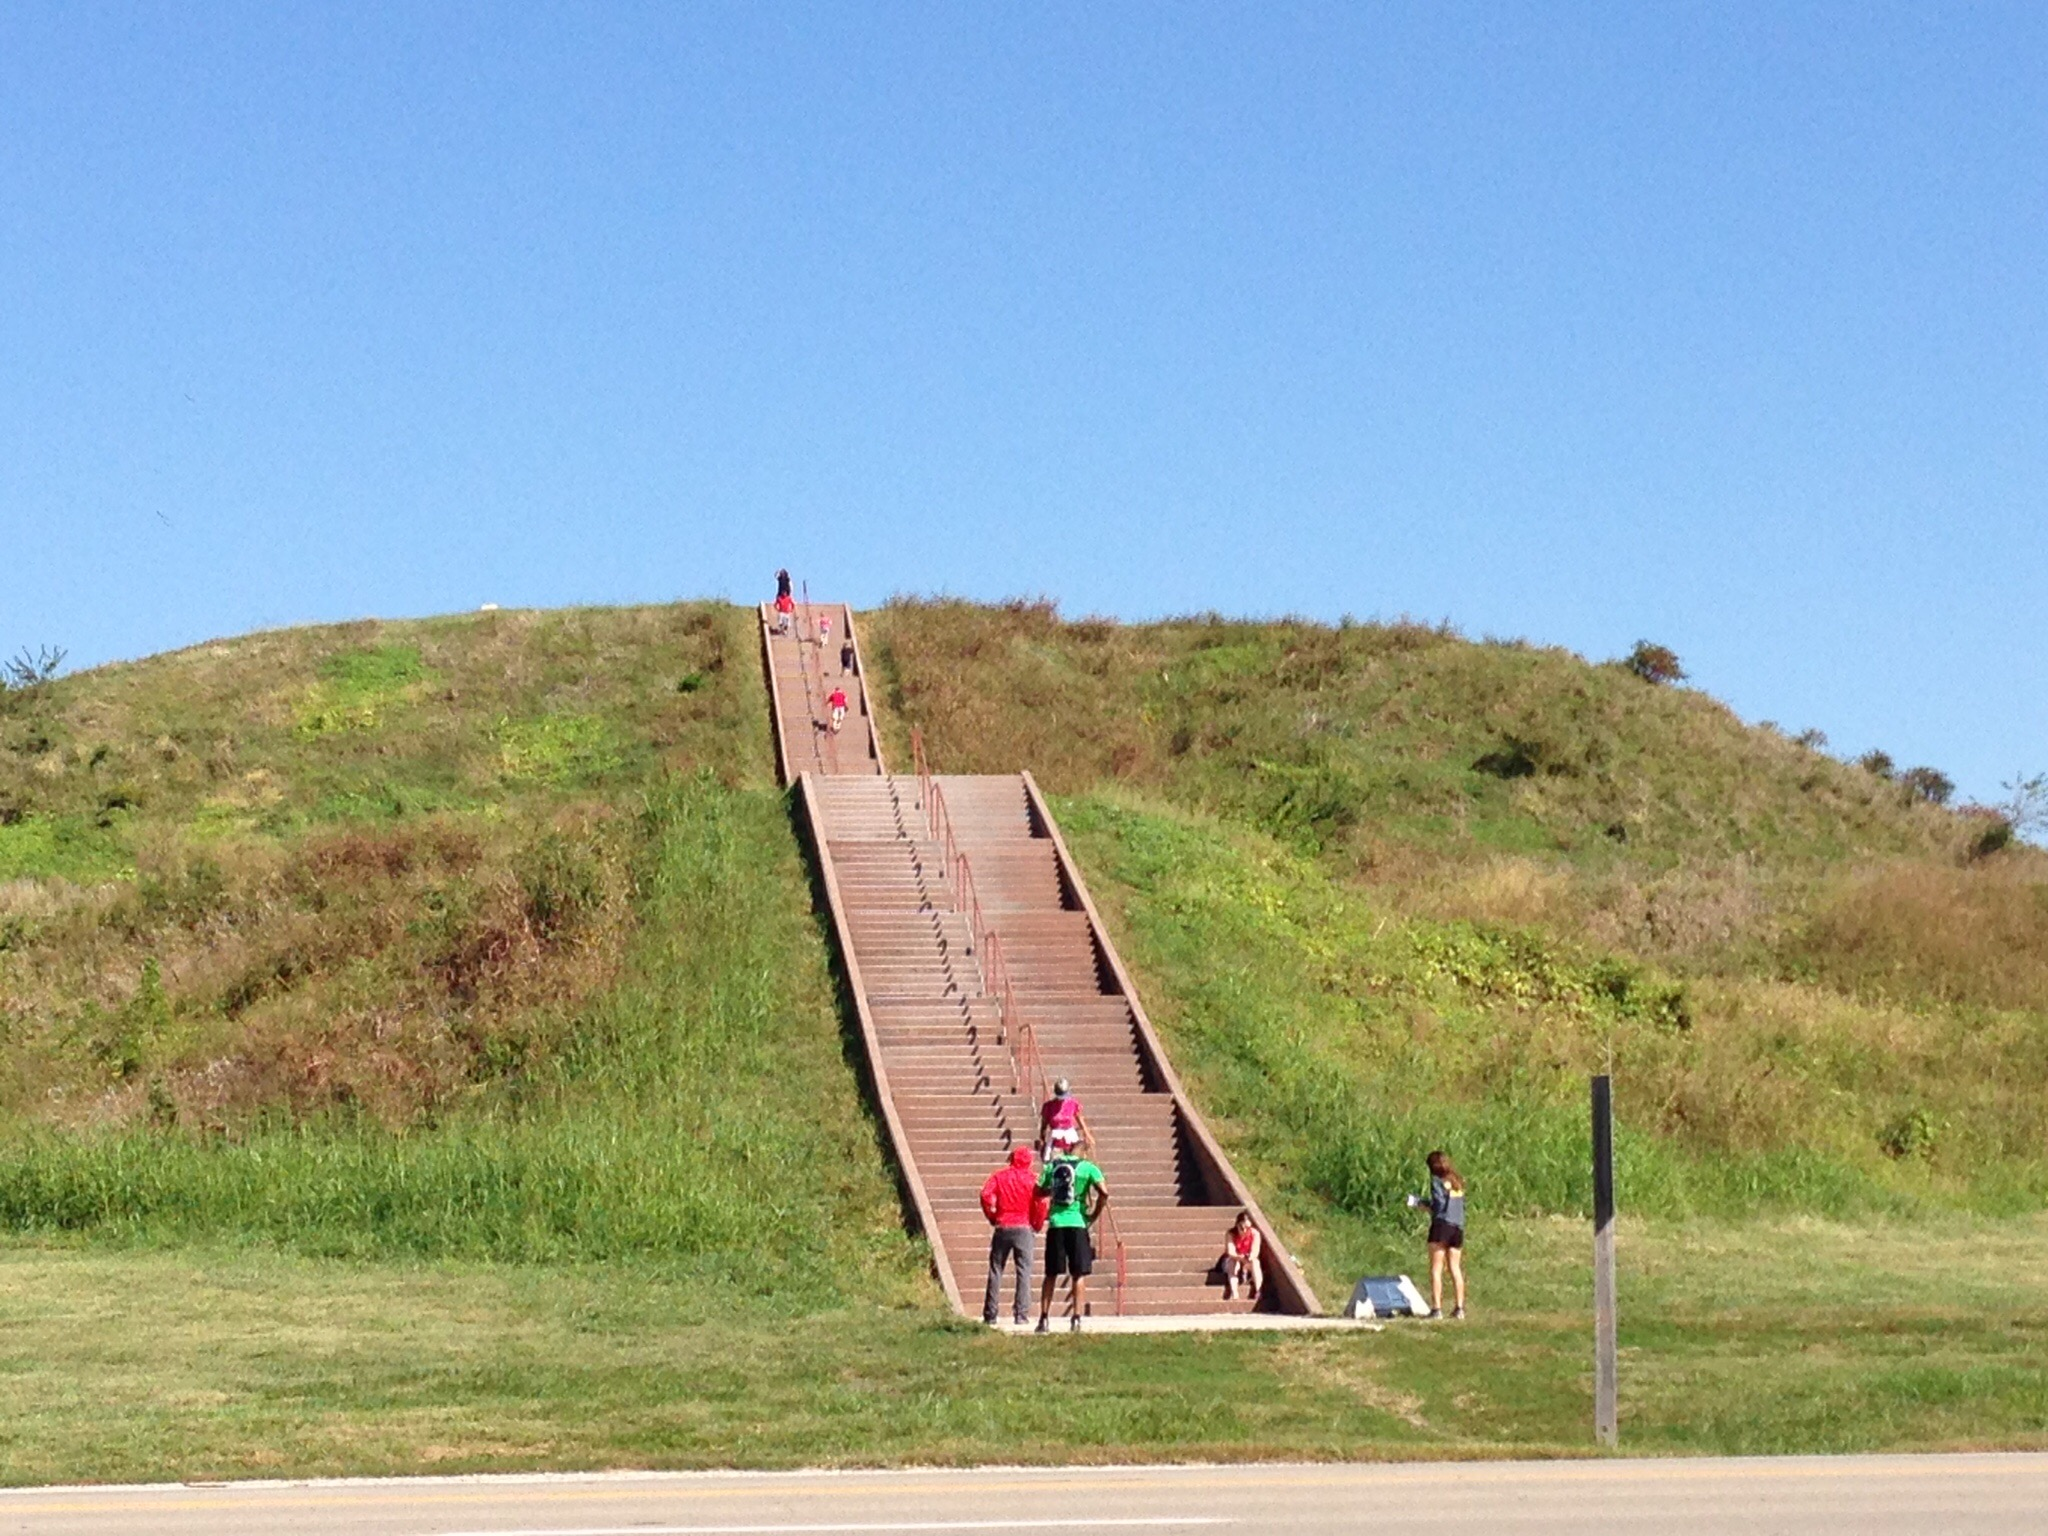 One gigantic mound of dirt